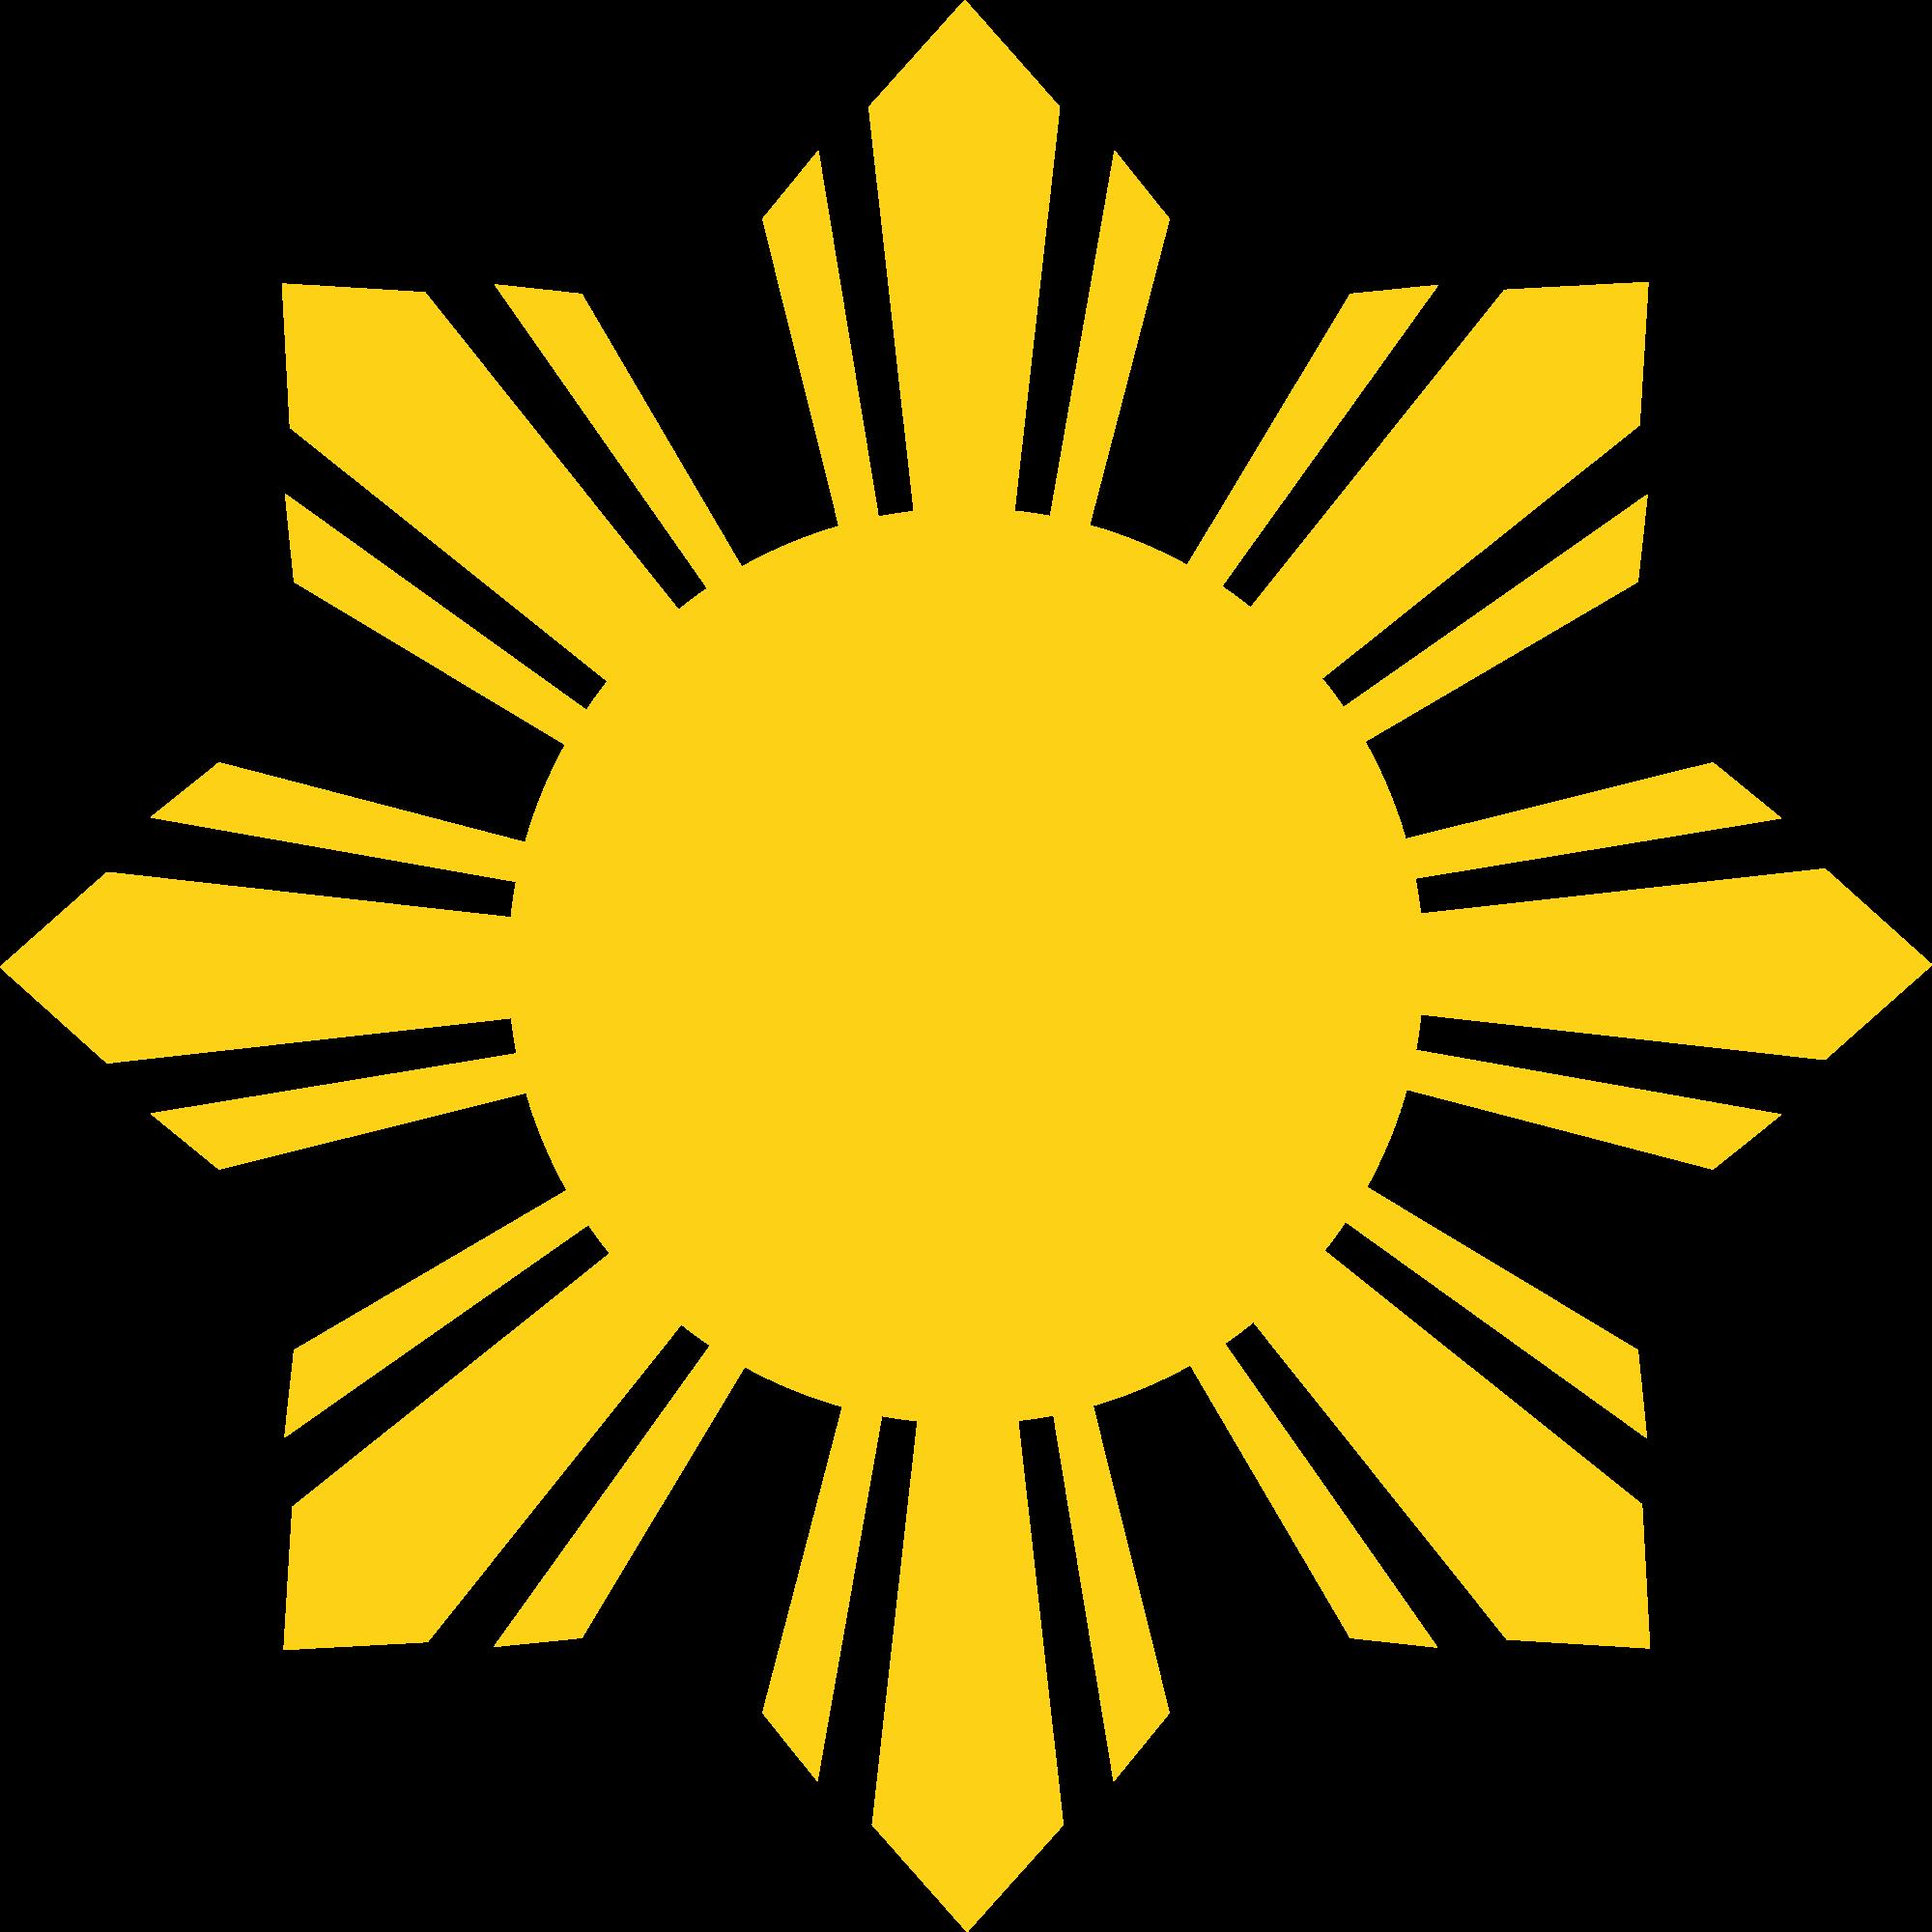 Markers clipart flag. Filipino cultural symbols my